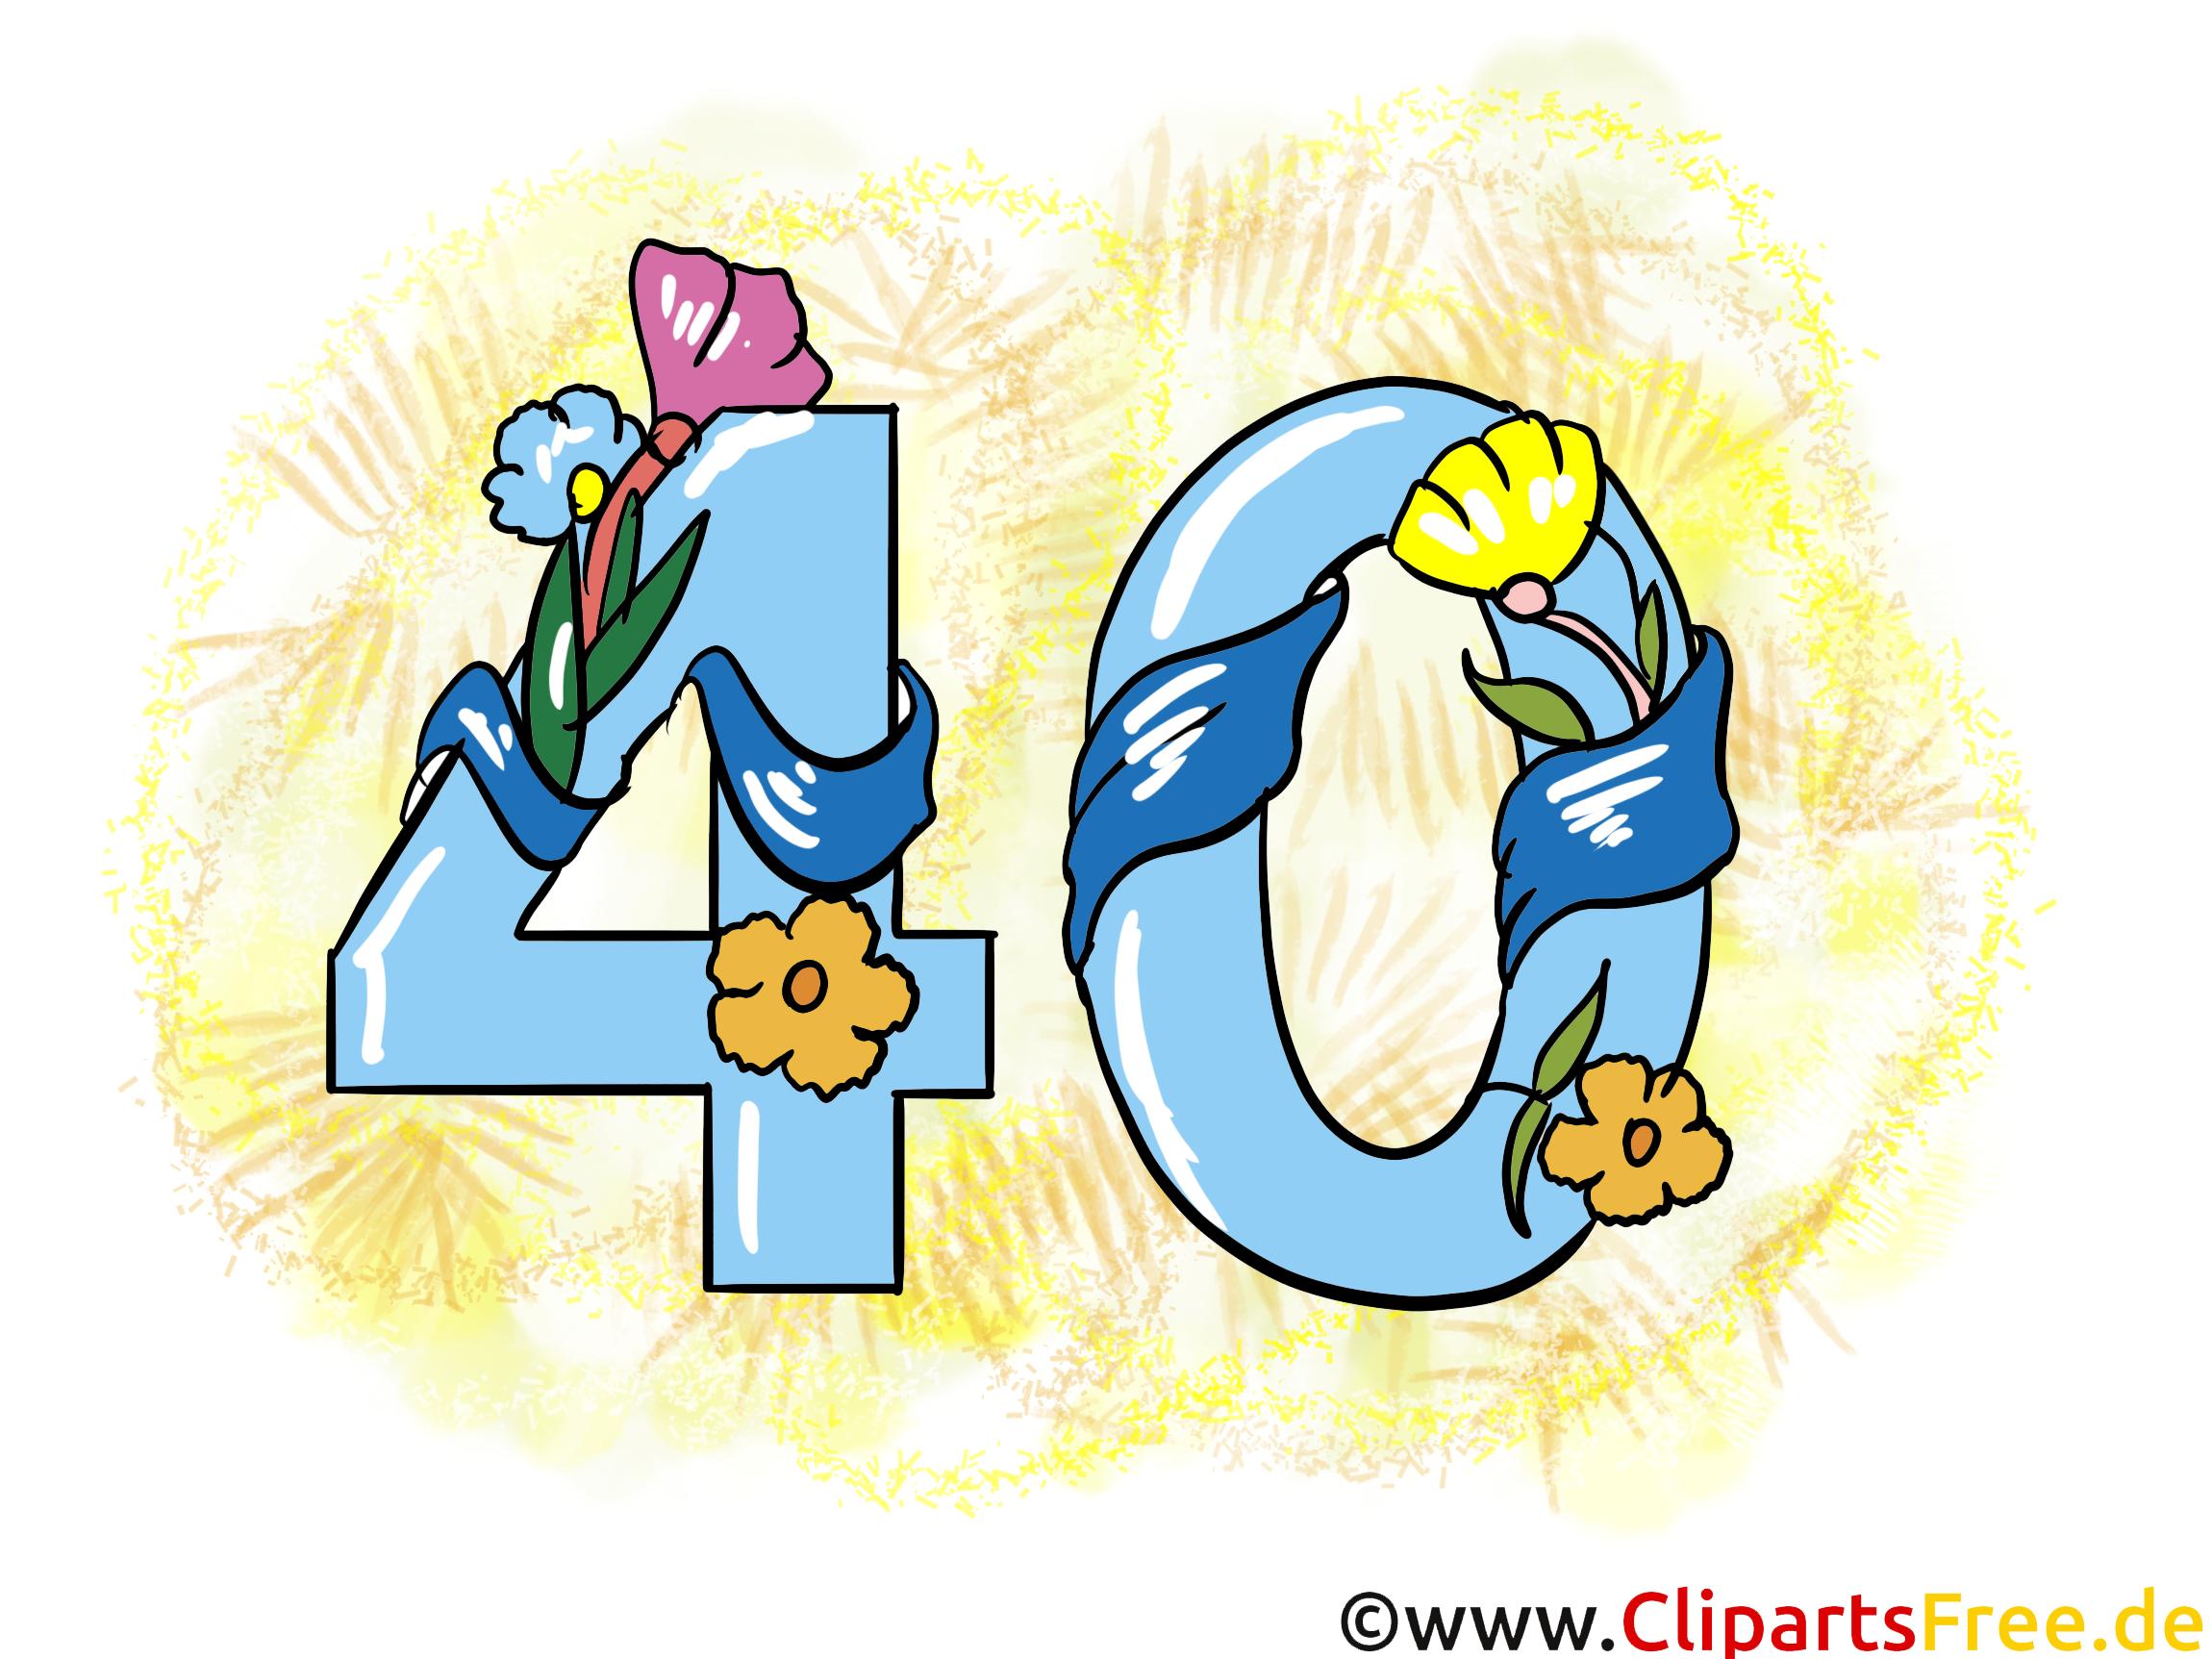 Glückwunsch 40 Jahre Clipart Grusskarte Glückwunschkarte Ecard